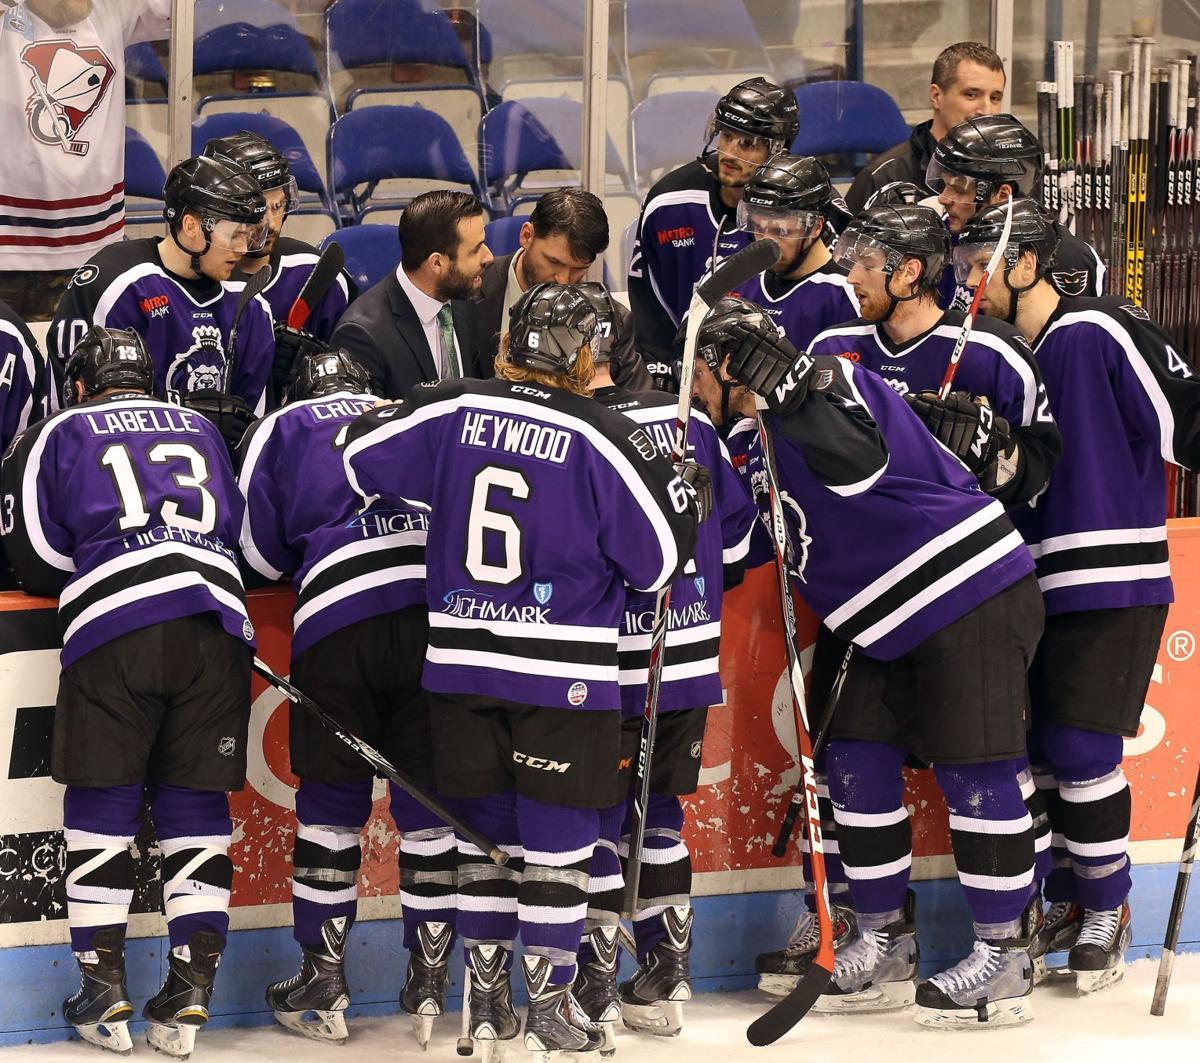 Stingrays win ECHL's East Division